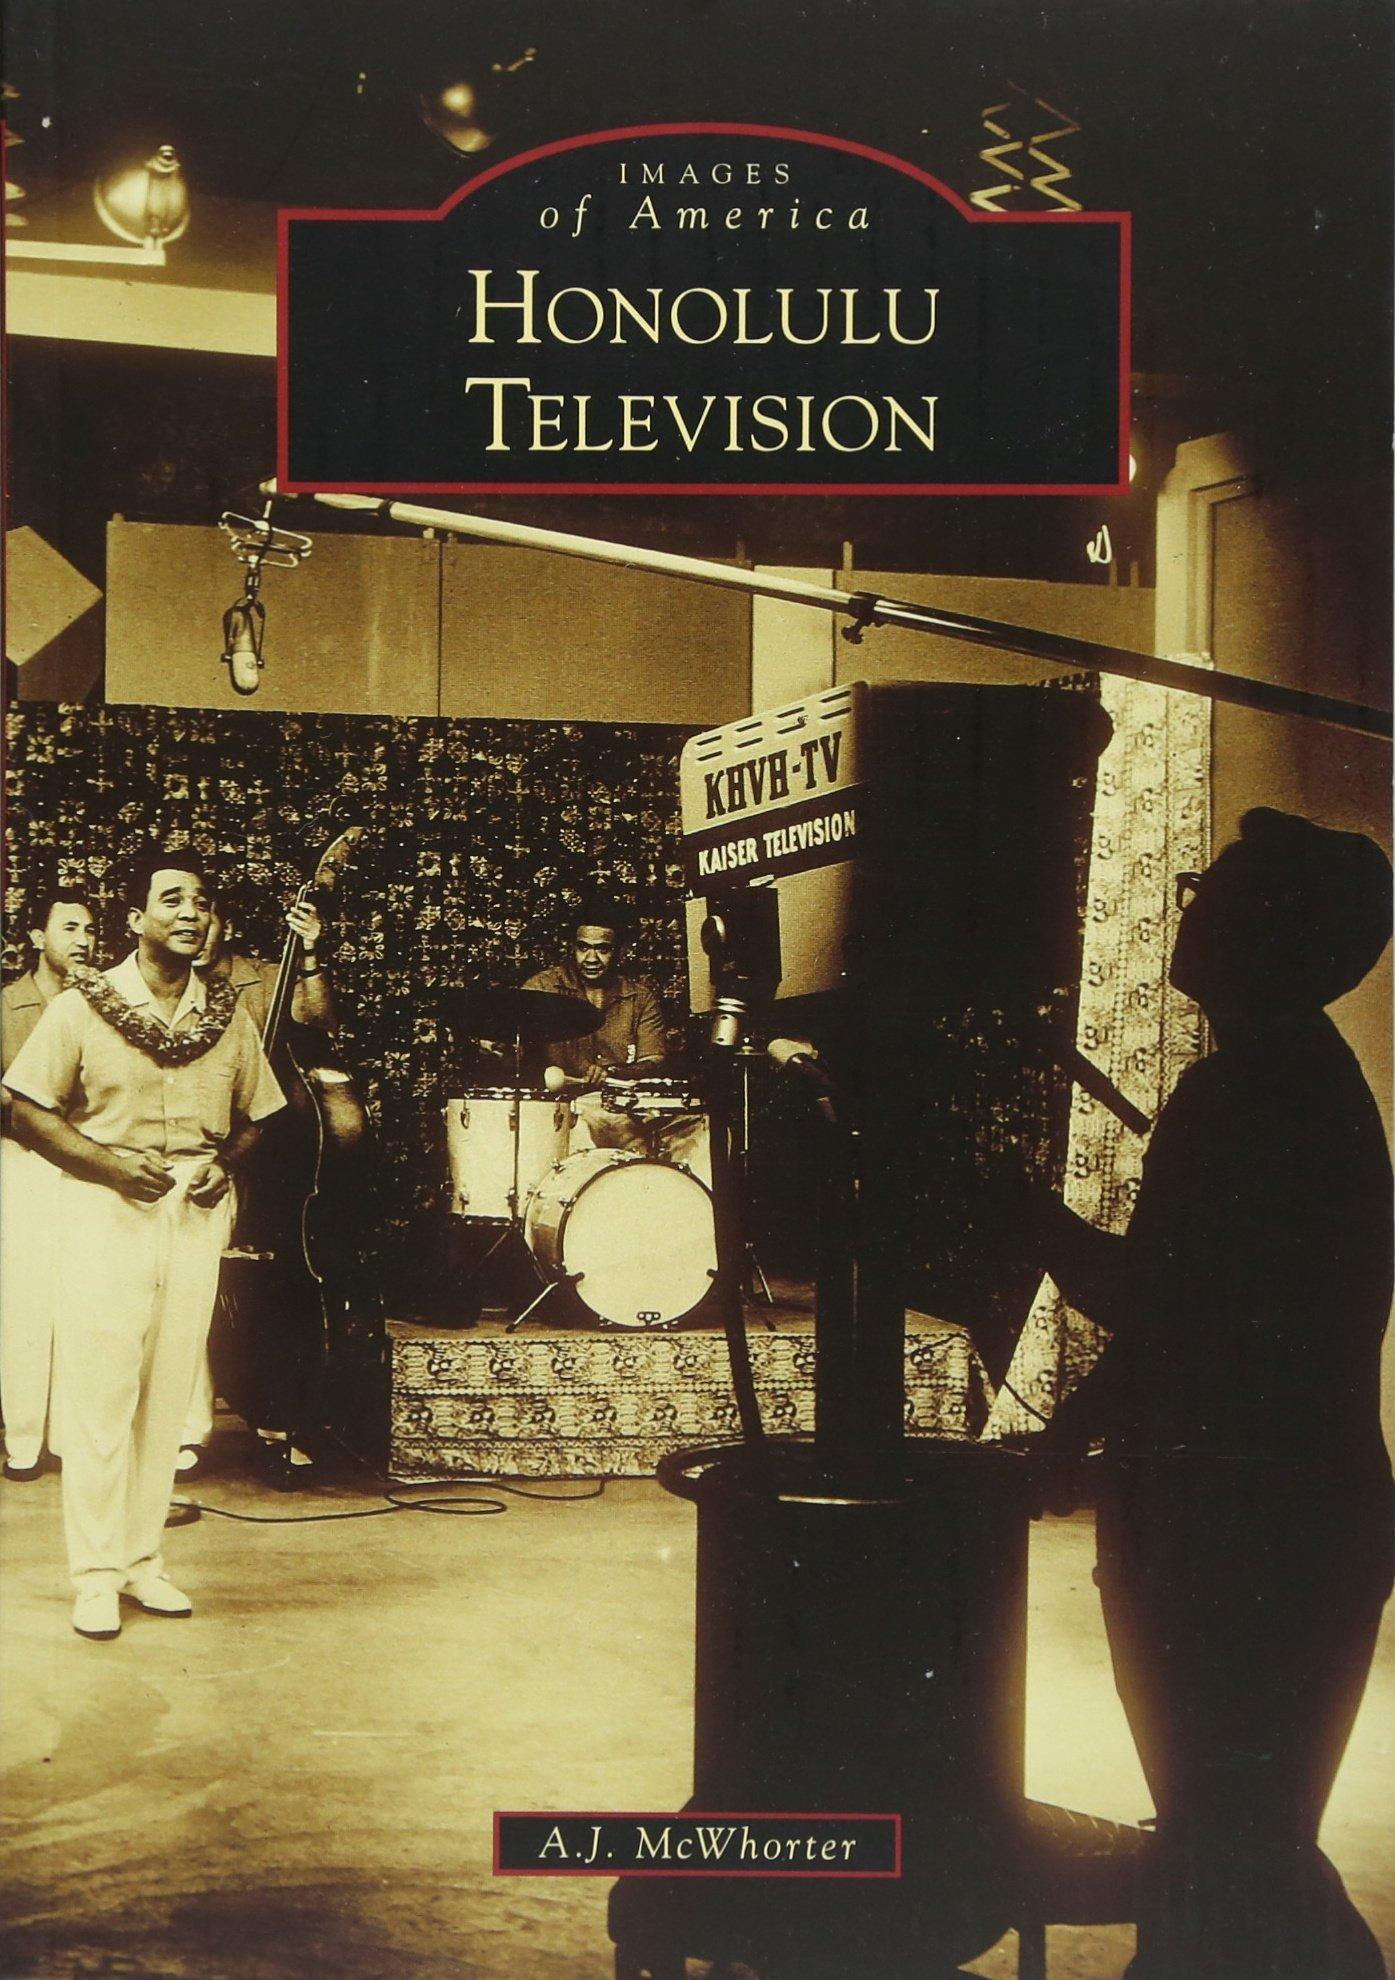 Honolulu Television (Images of America) ebook